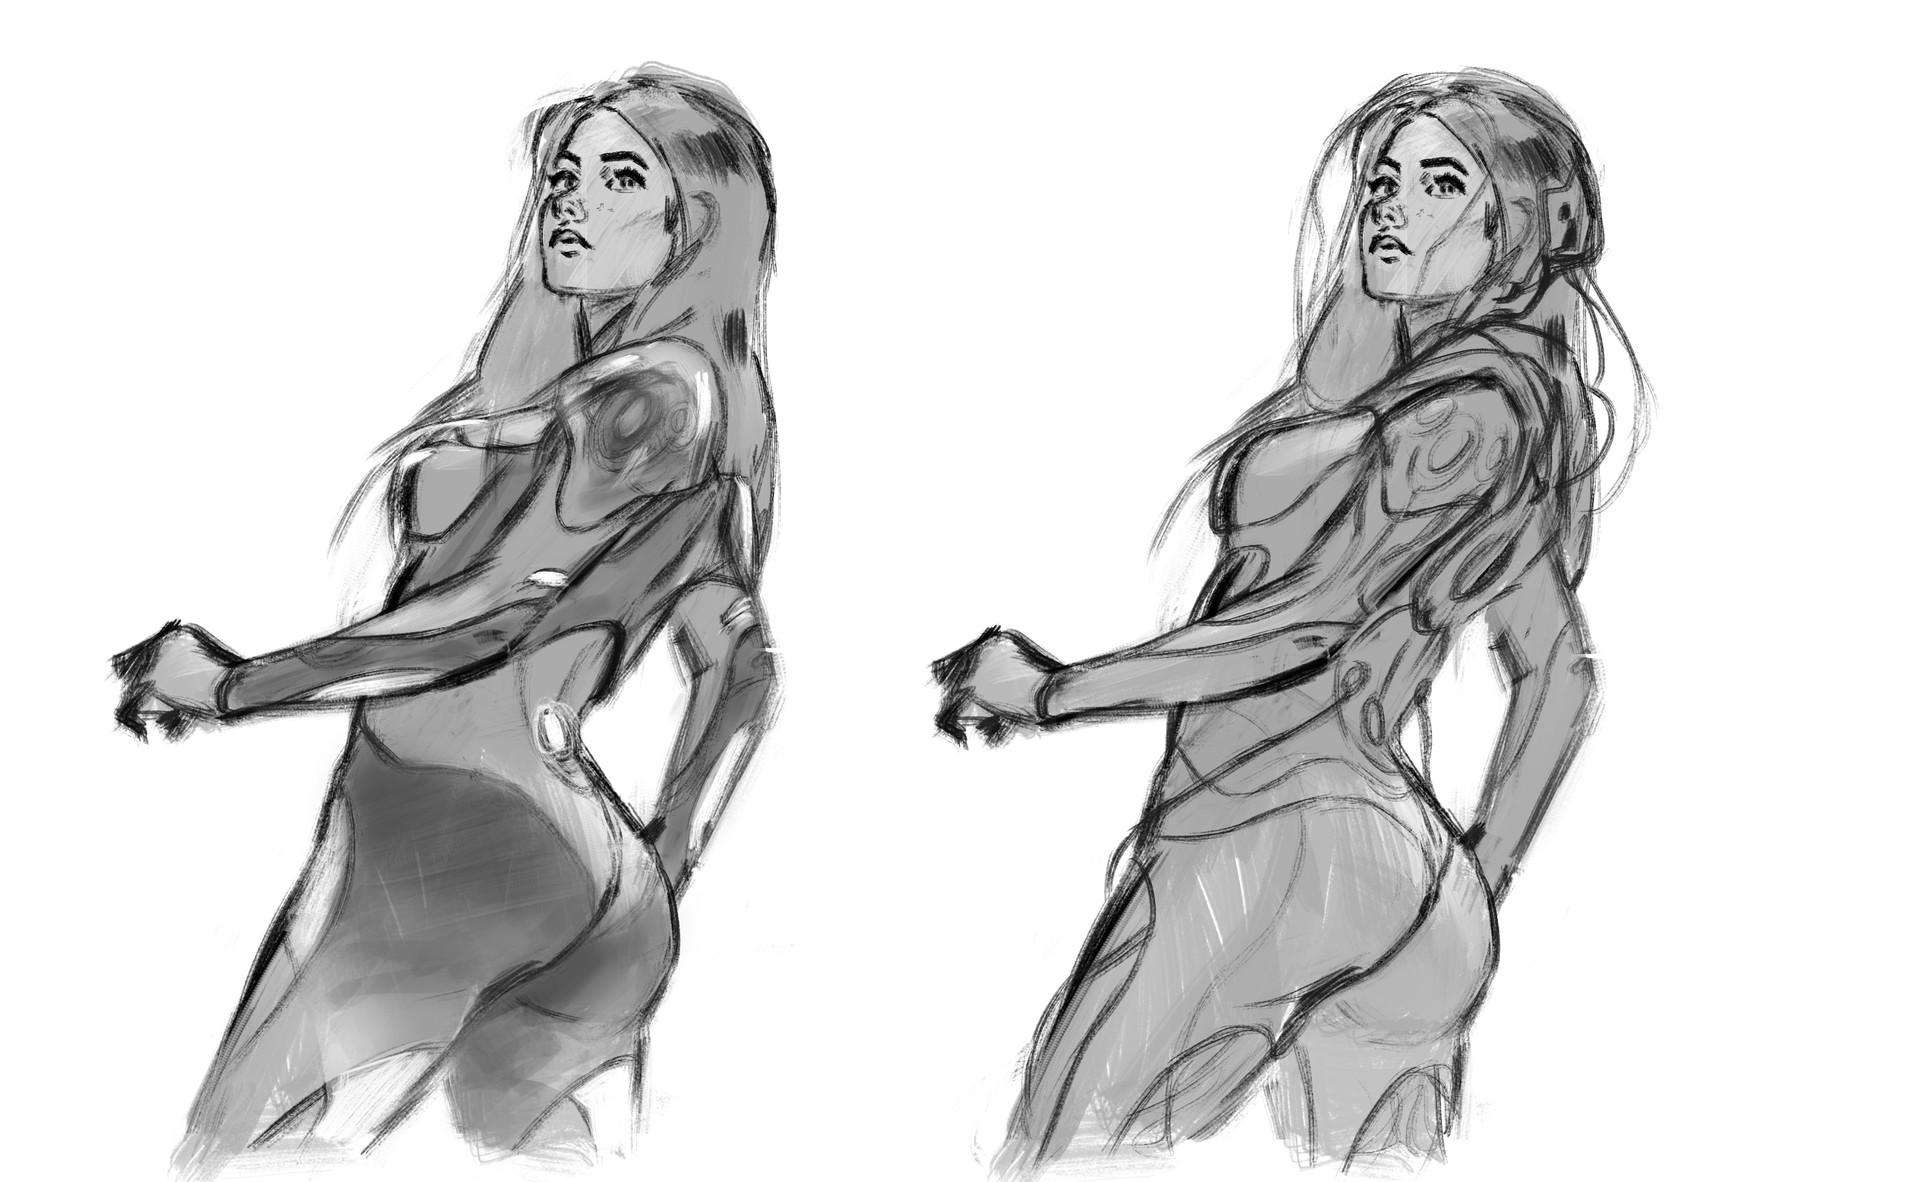 Marta nael ava sketch